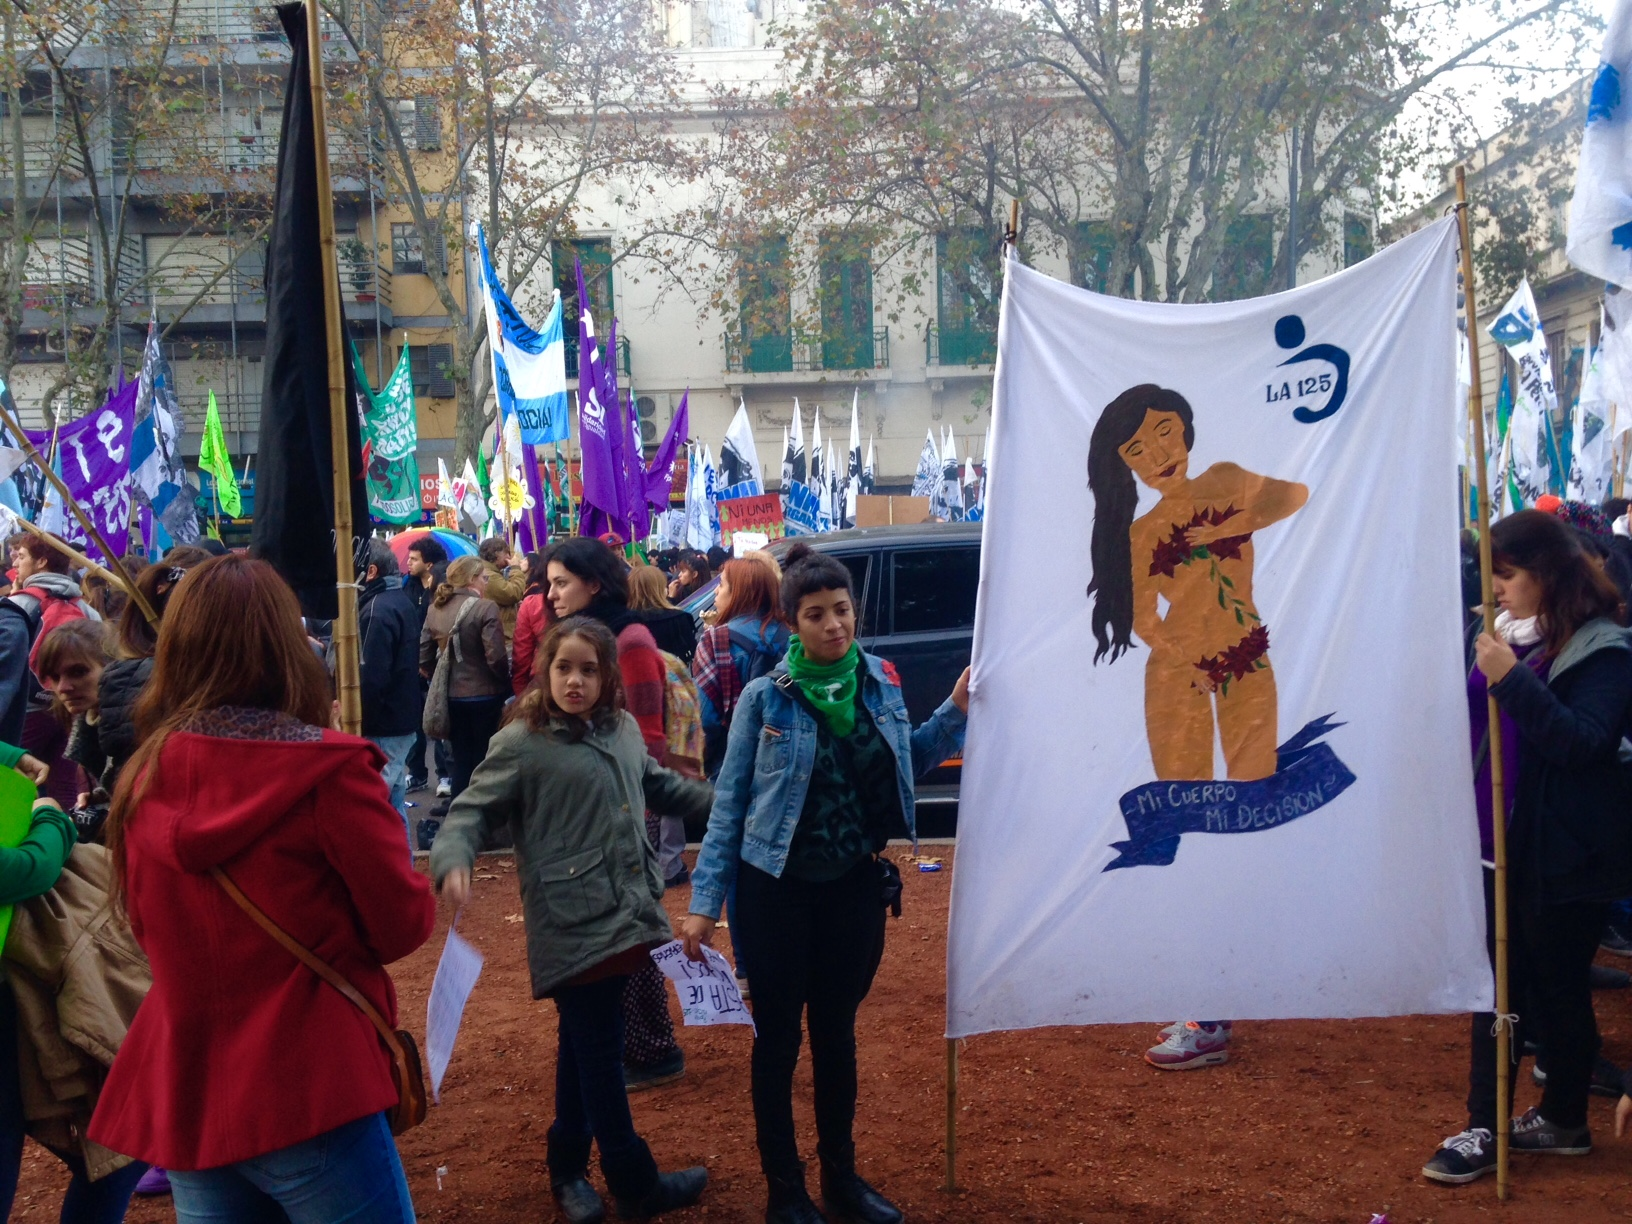 Photo credit: Fiona Gilligan. Protestors with art and murals.